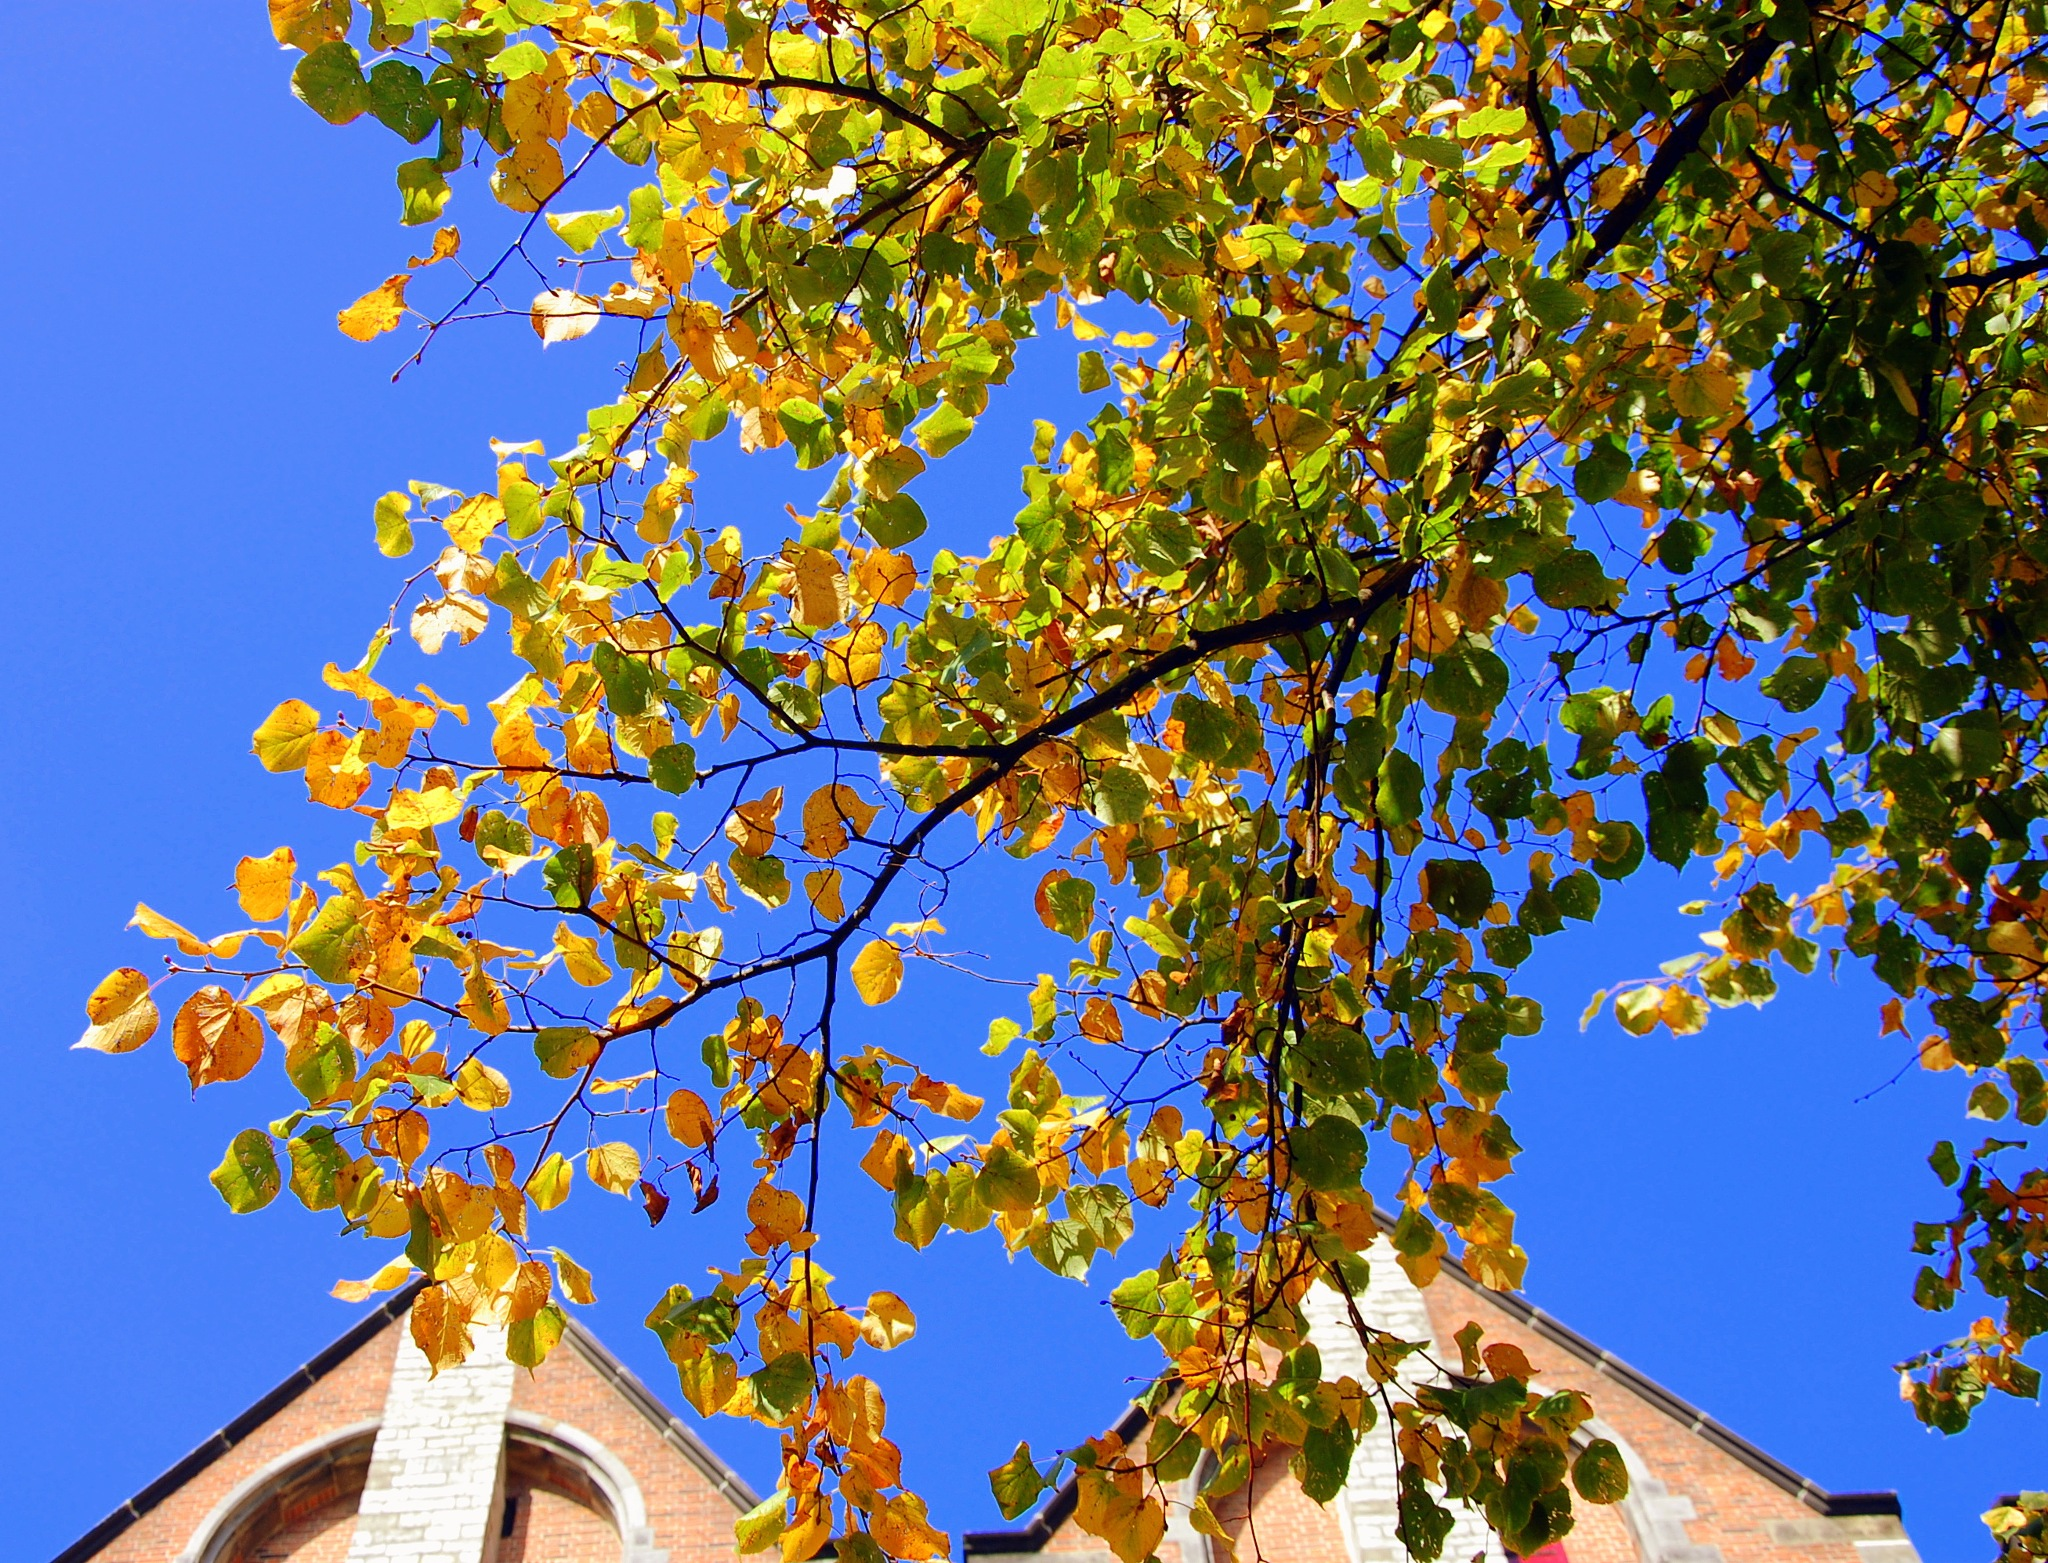 Autumn Glory In Leiden by goga.dt